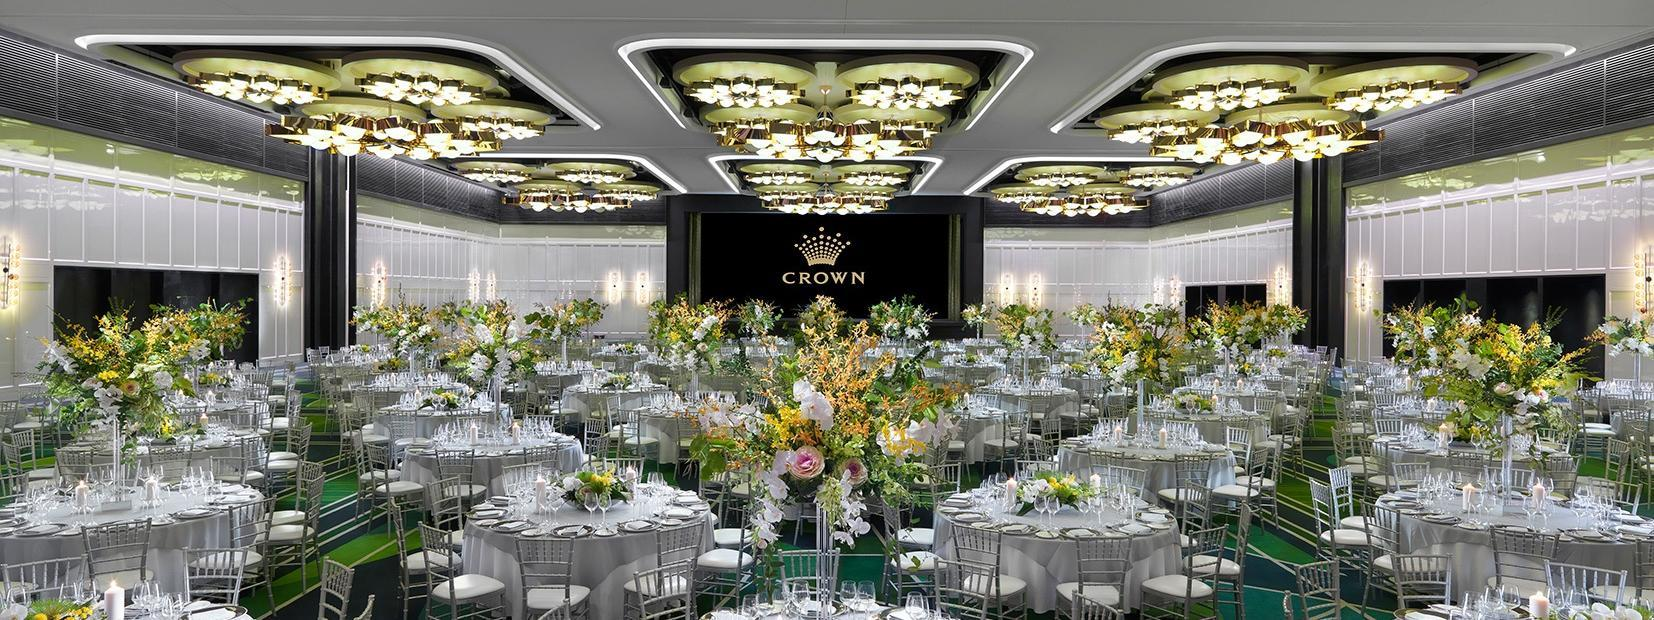 Crown Ballroom at Crown Hotel Perth